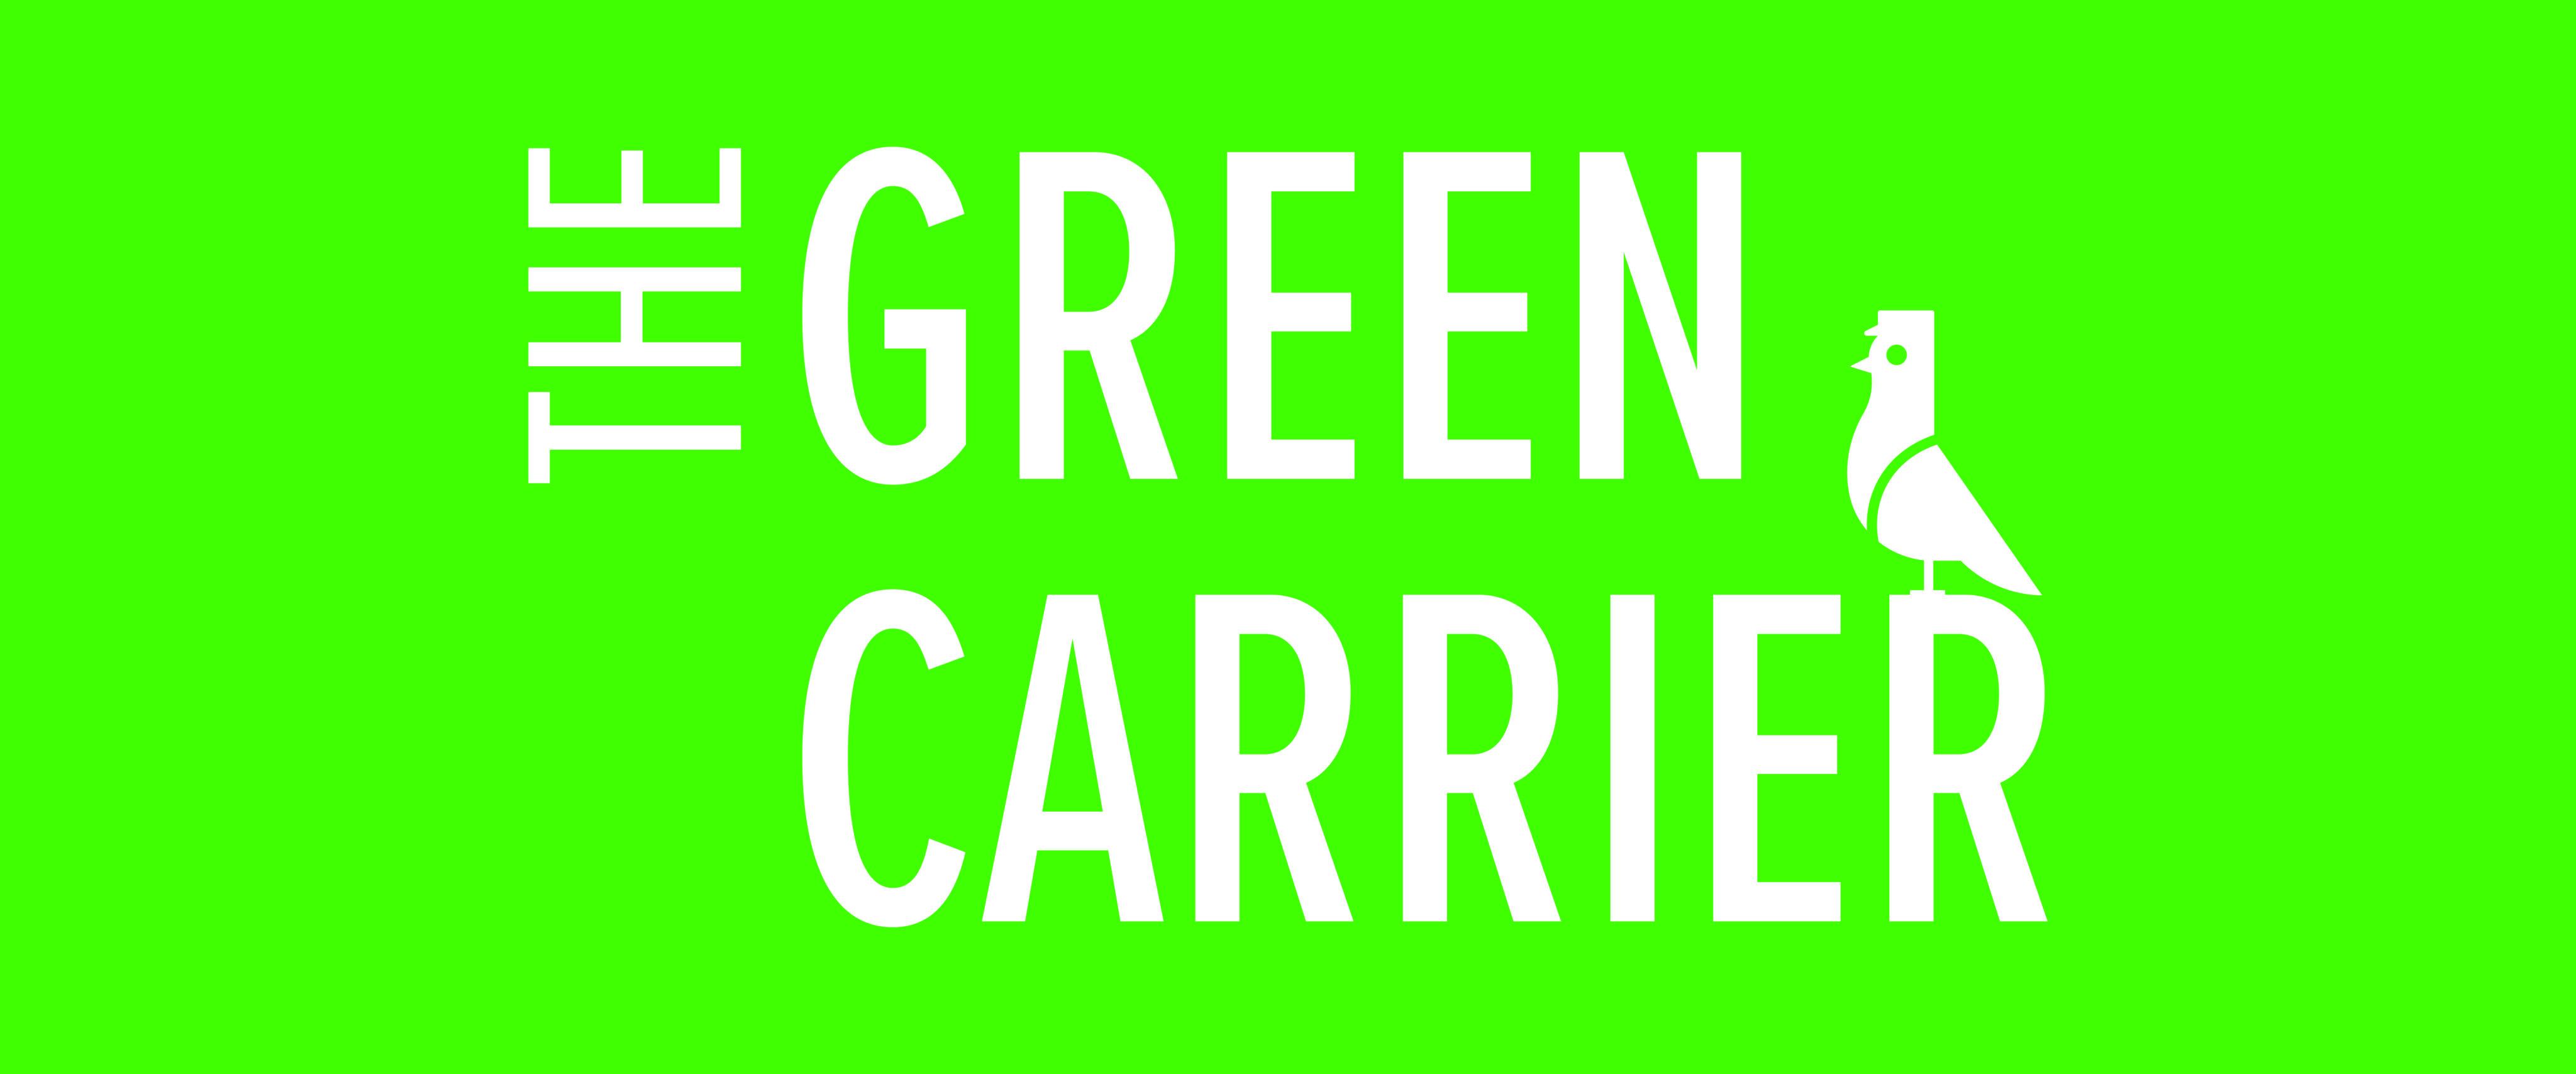 The Green Carrier logo on a website banner format.